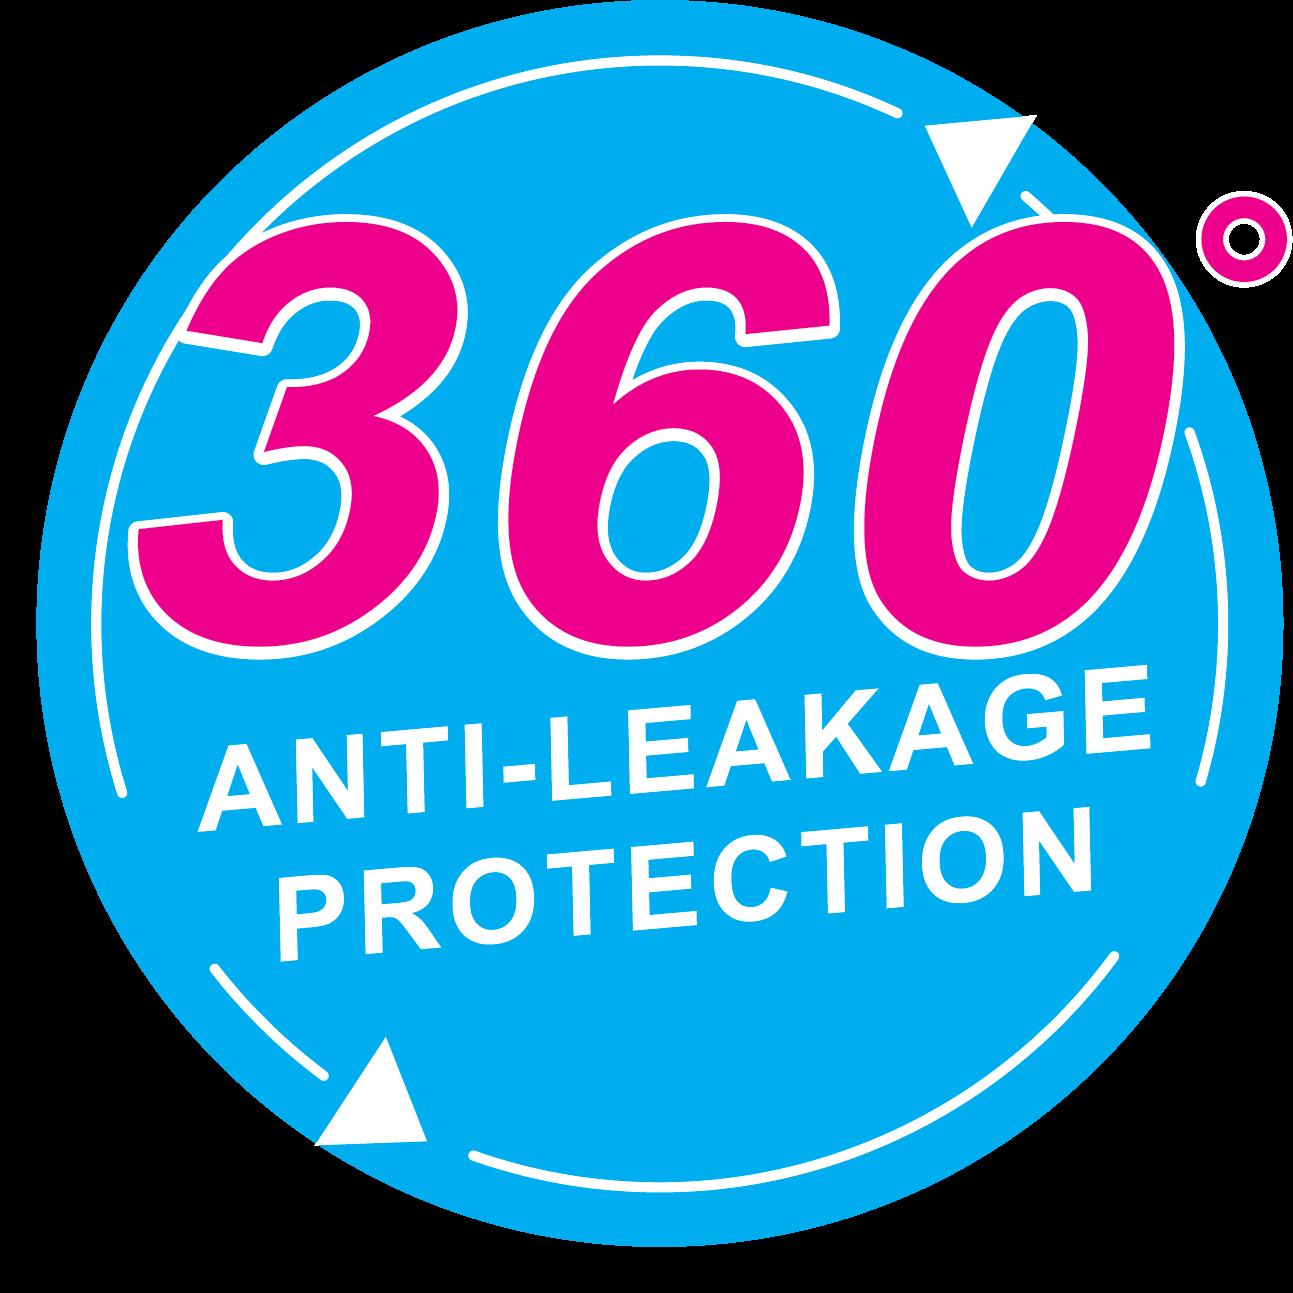 360 degree leakage protection